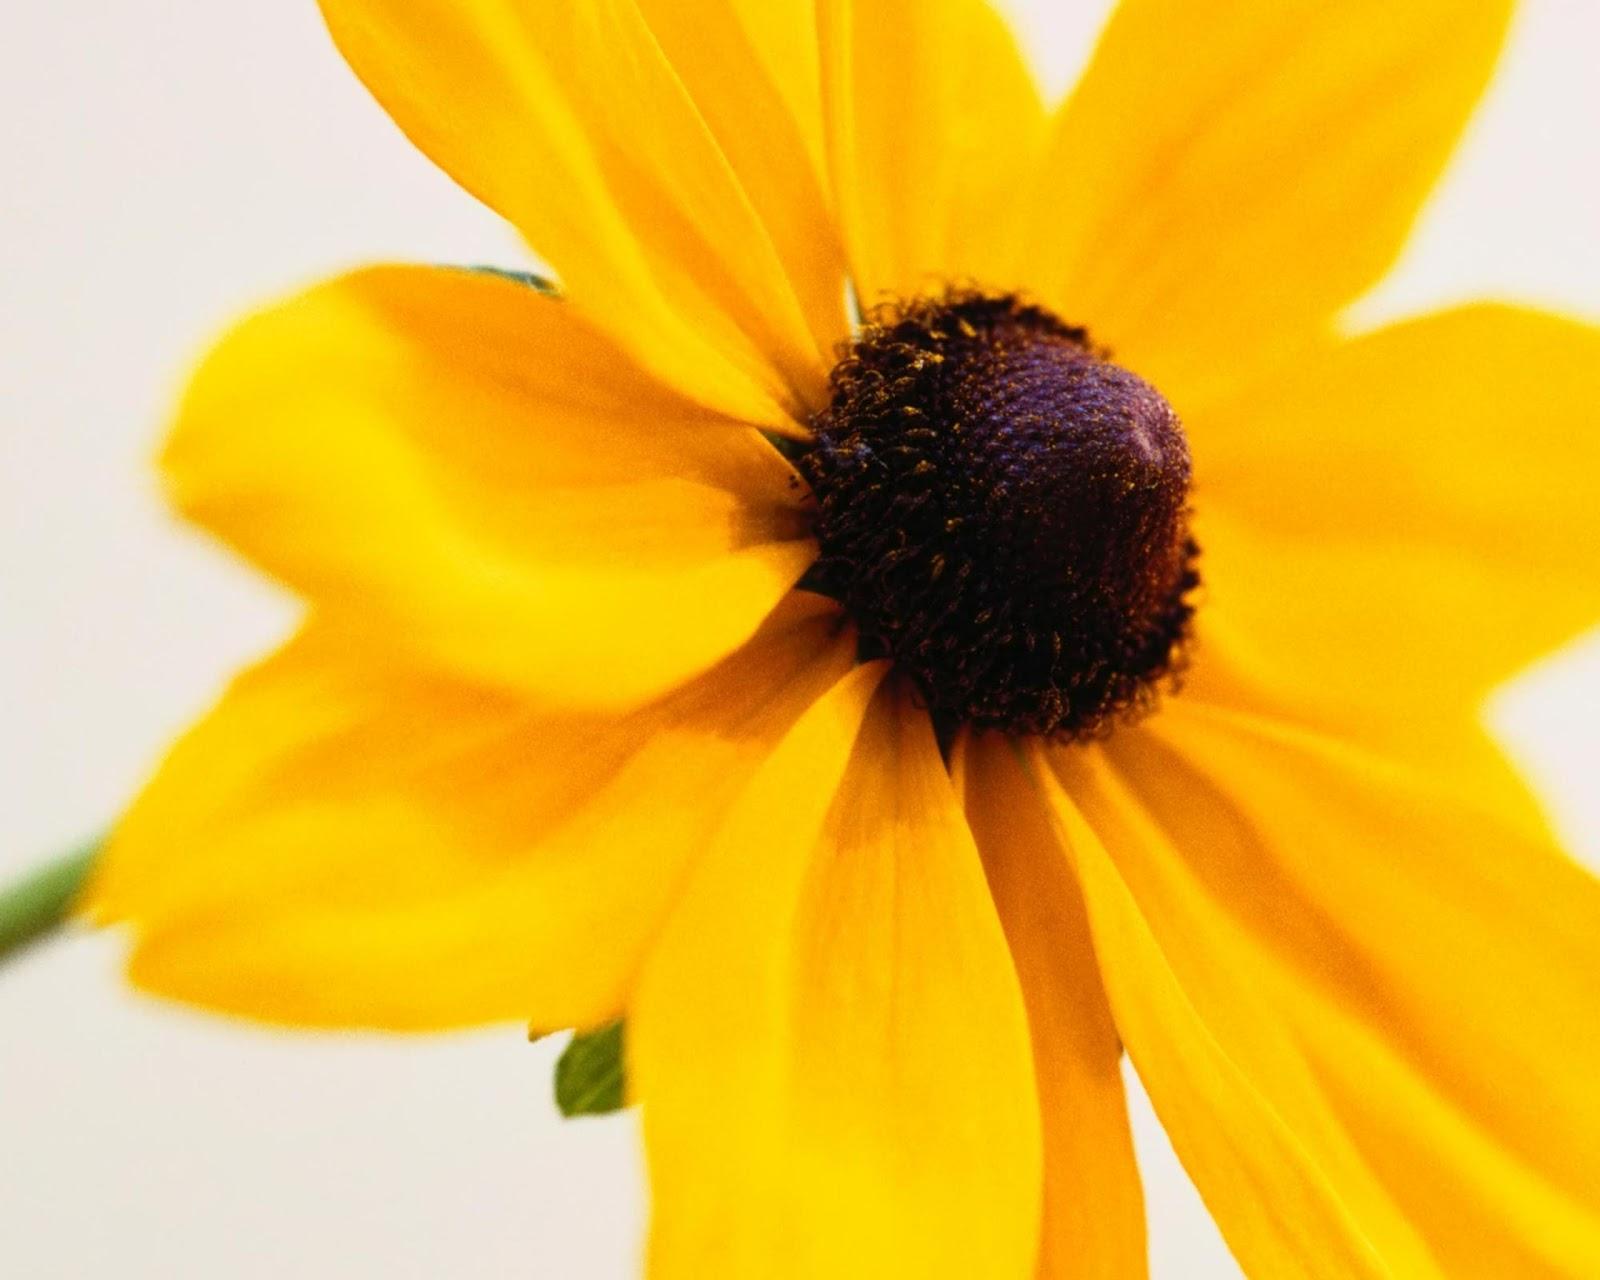 http://1.bp.blogspot.com/-lryvTQ8xIM4/T66zoOIuv4I/AAAAAAAABWM/sAKeculA_Bc/s1600/yellow-daisy-petals1-2048x2560.jpg